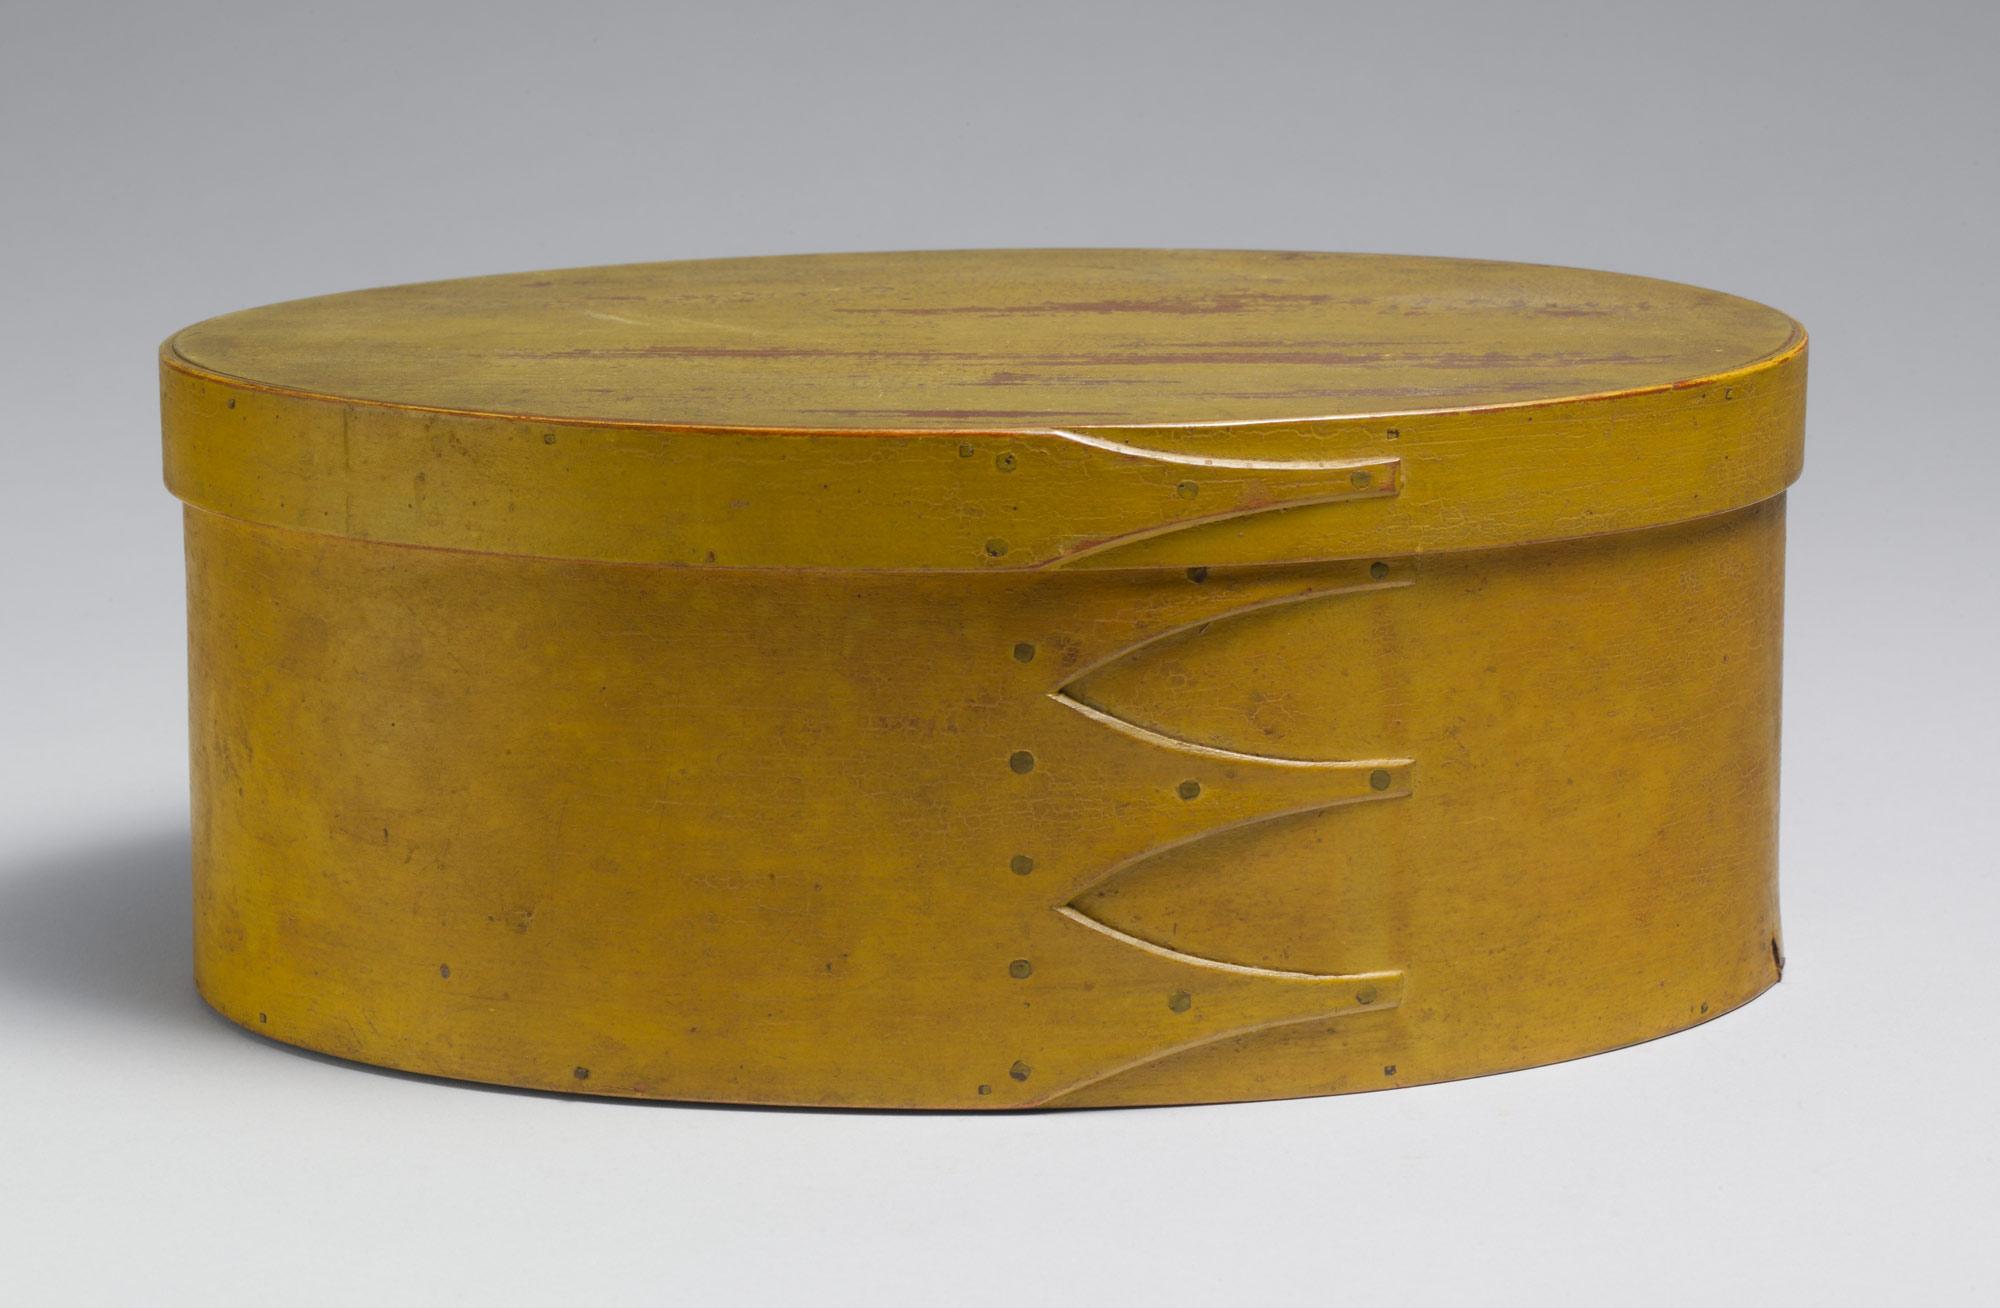 Furniture Box Shaker Furniture Essay Heilbrunn Timeline Of Art History The